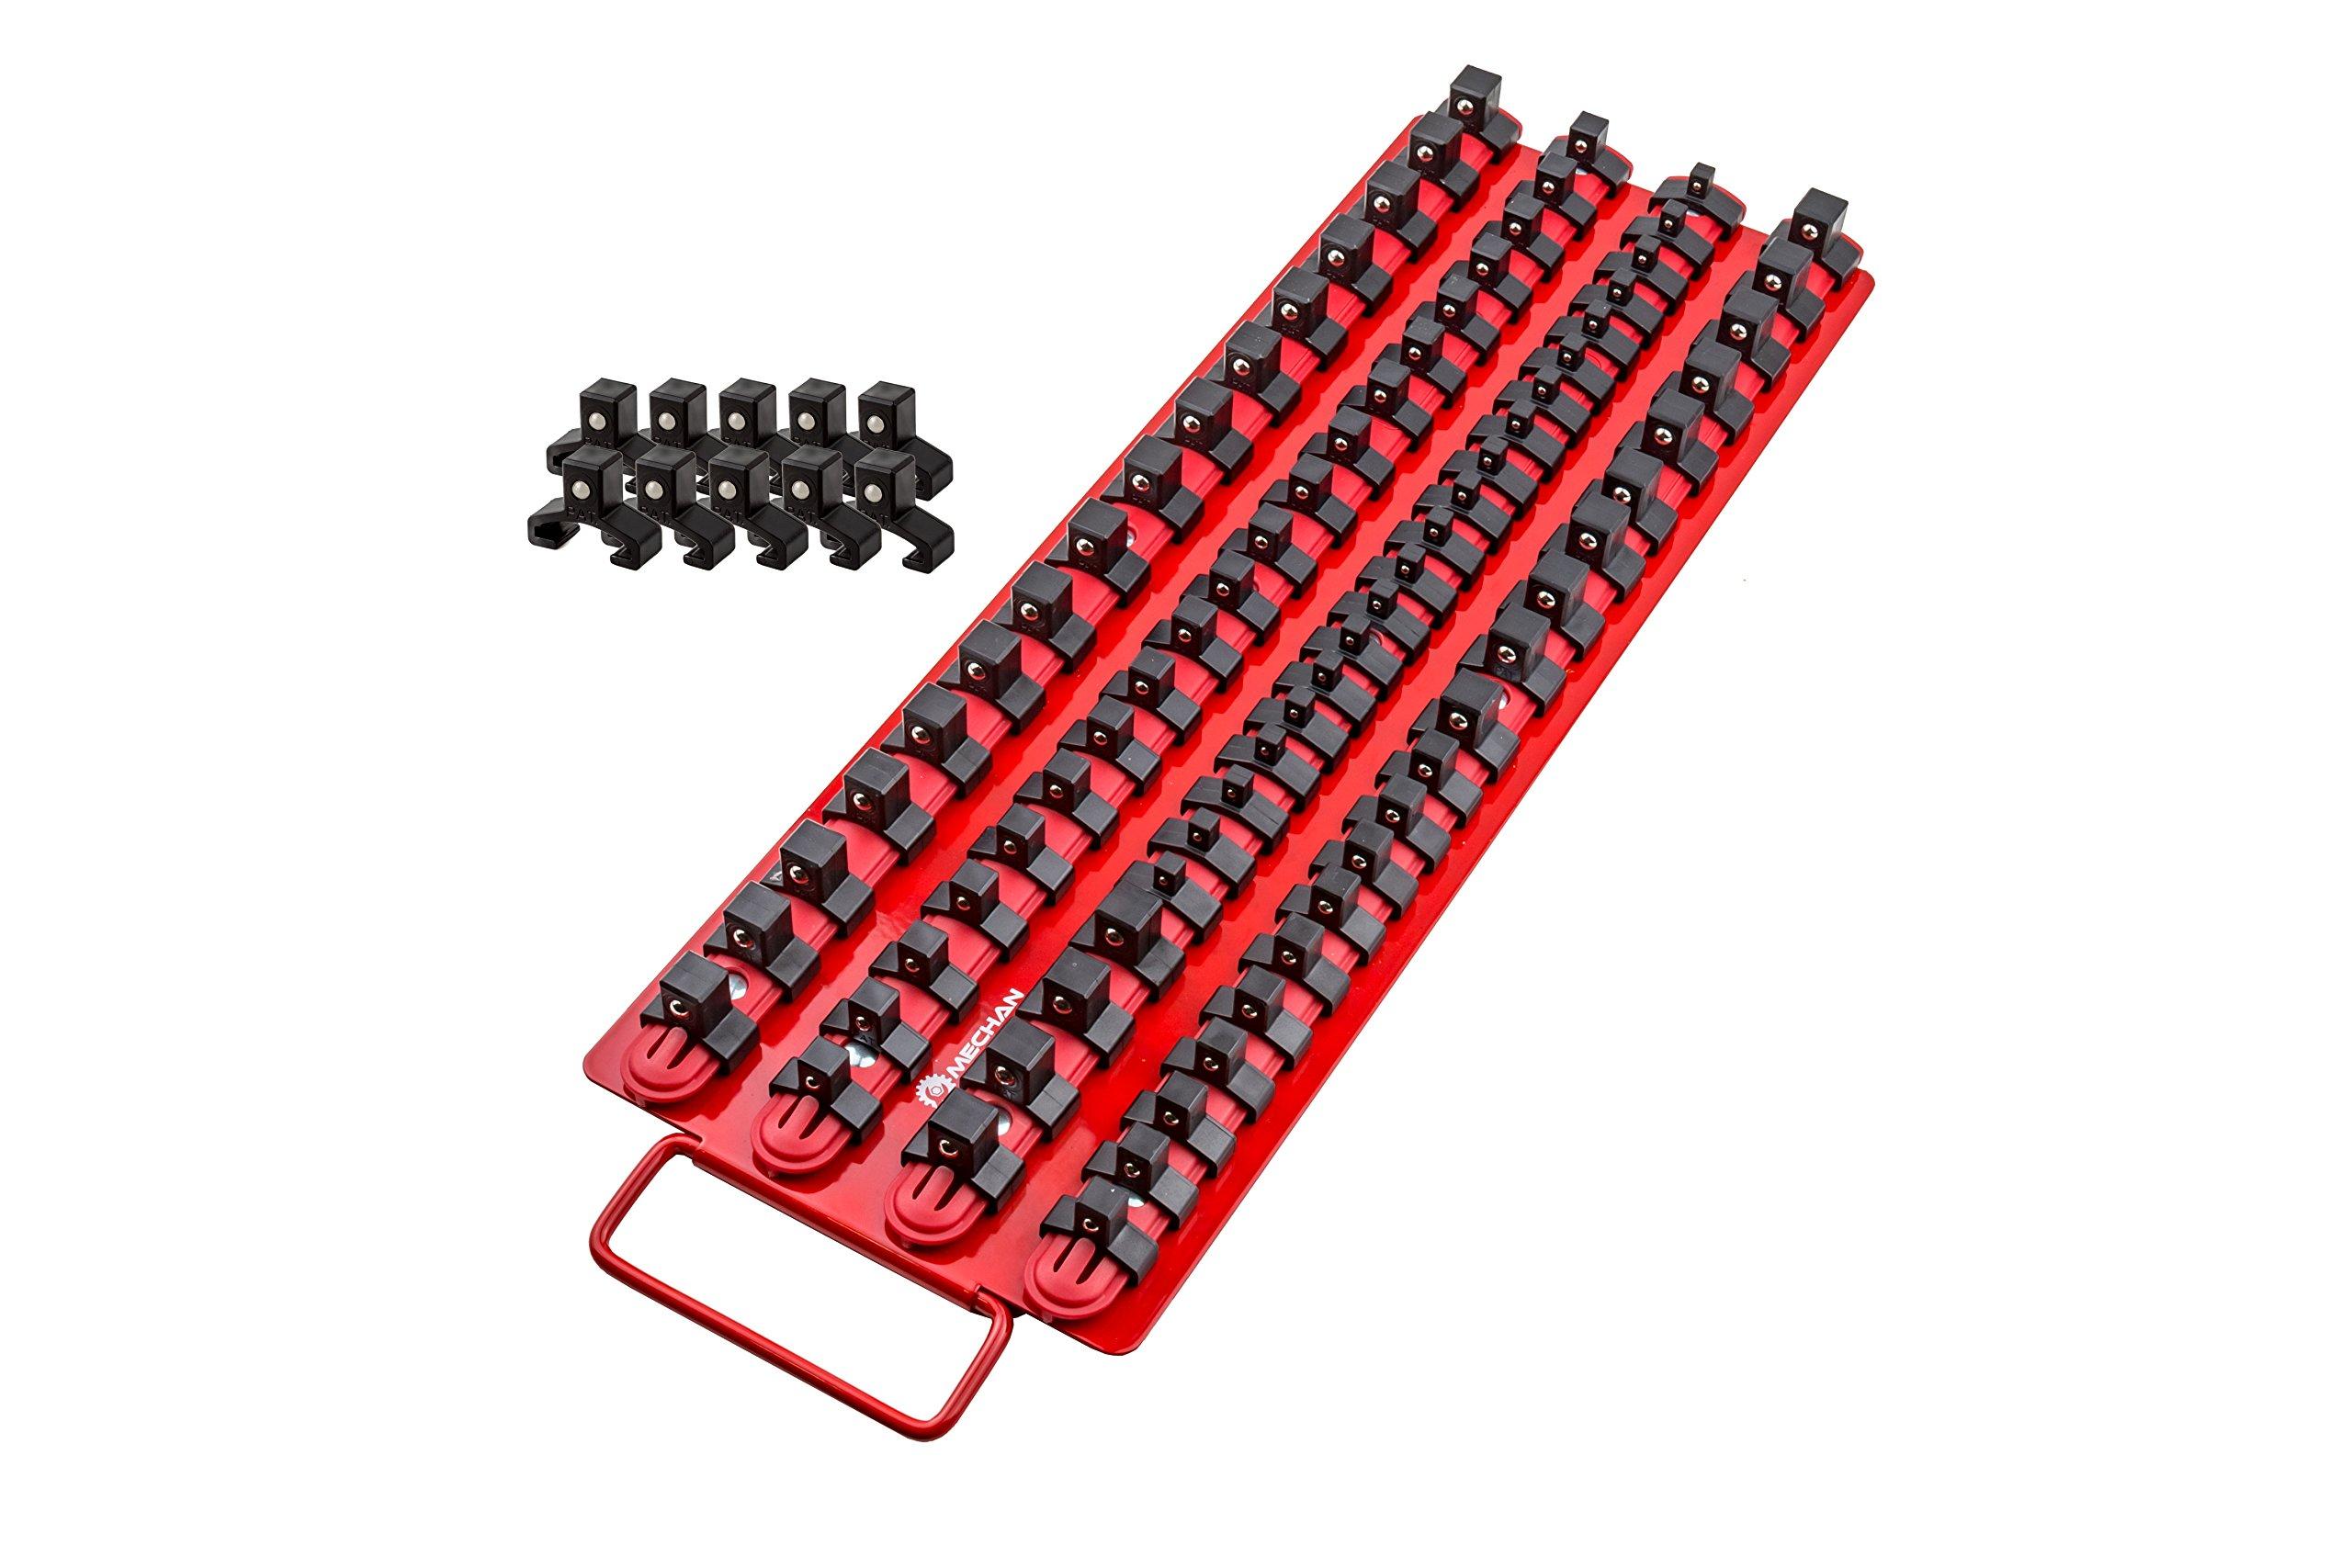 80pc Portable Socket Organizer Tray – Premium Socket Tray – Adjustable Socket Wrench Holder – Sturdy Socket Rails With Spring Loaded Ball Bearing Socket Clips For Tool Box Organization